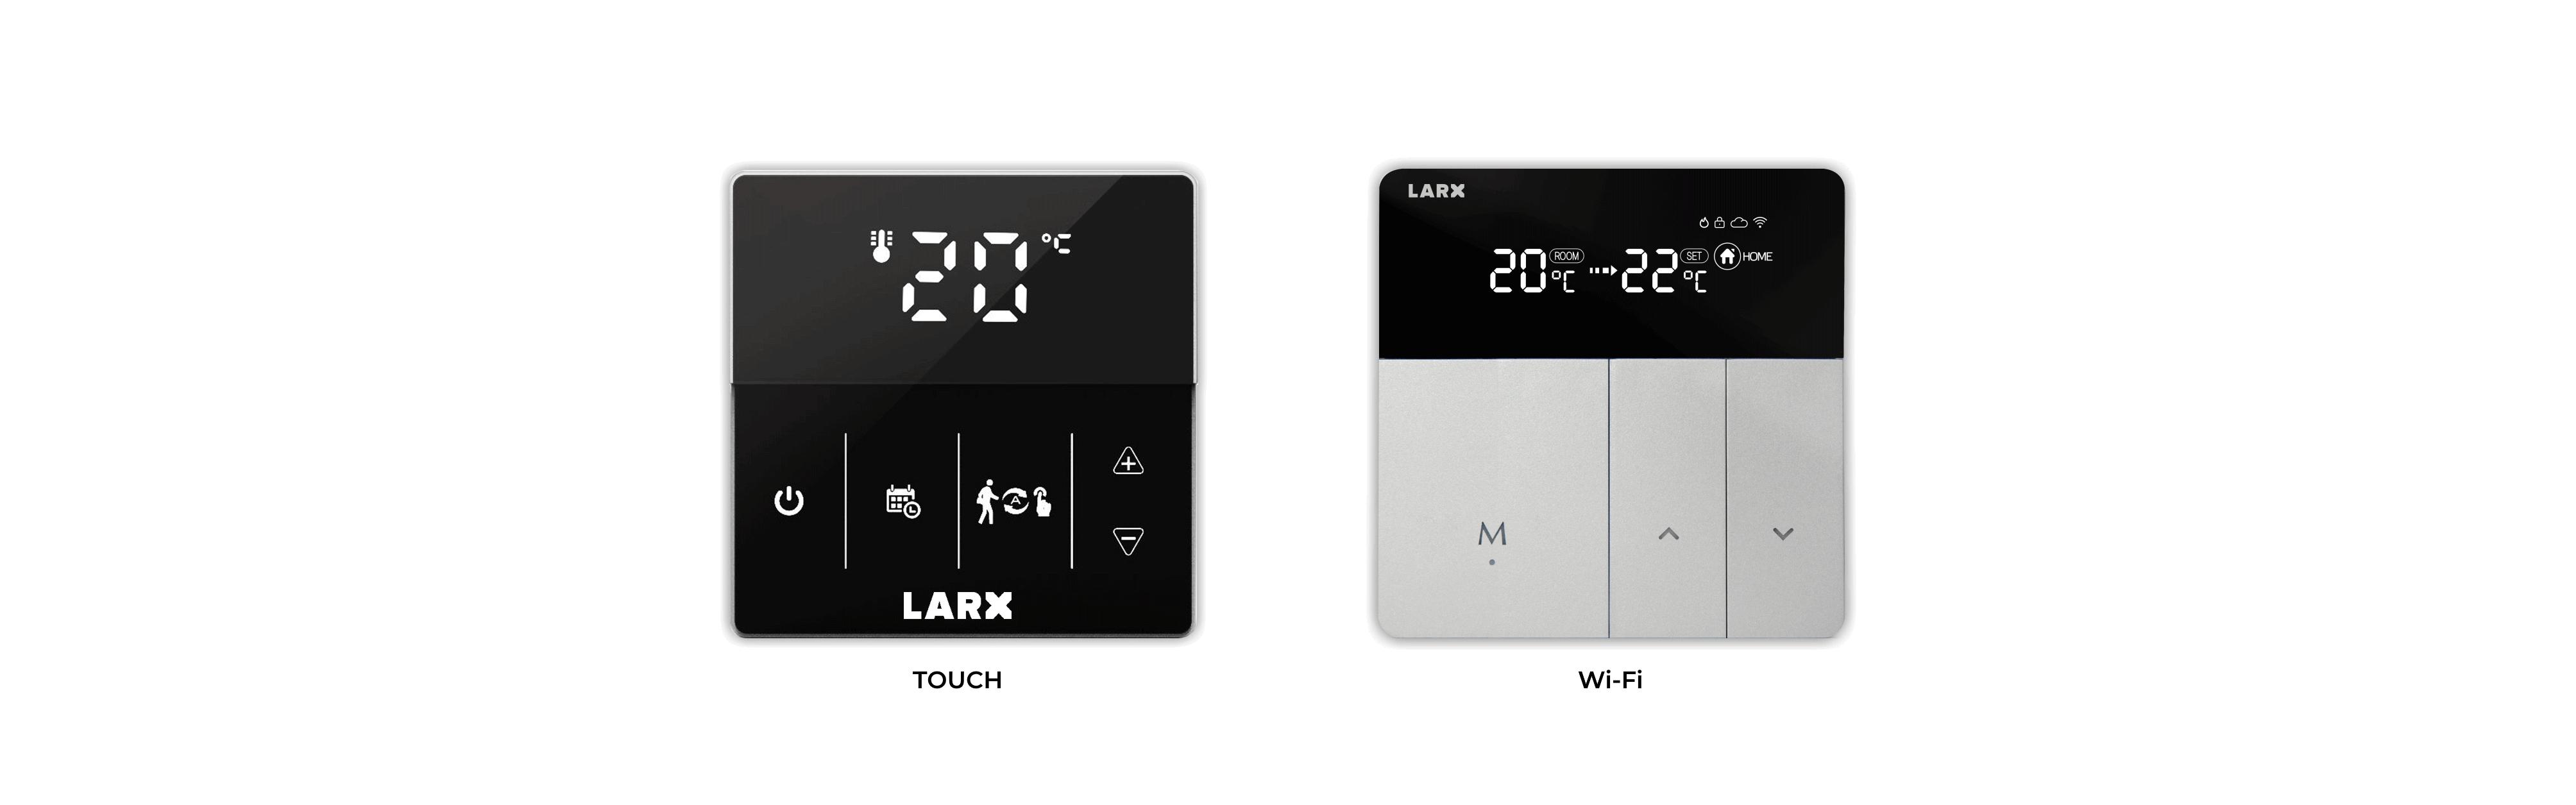 LARX thermostat for efficient control